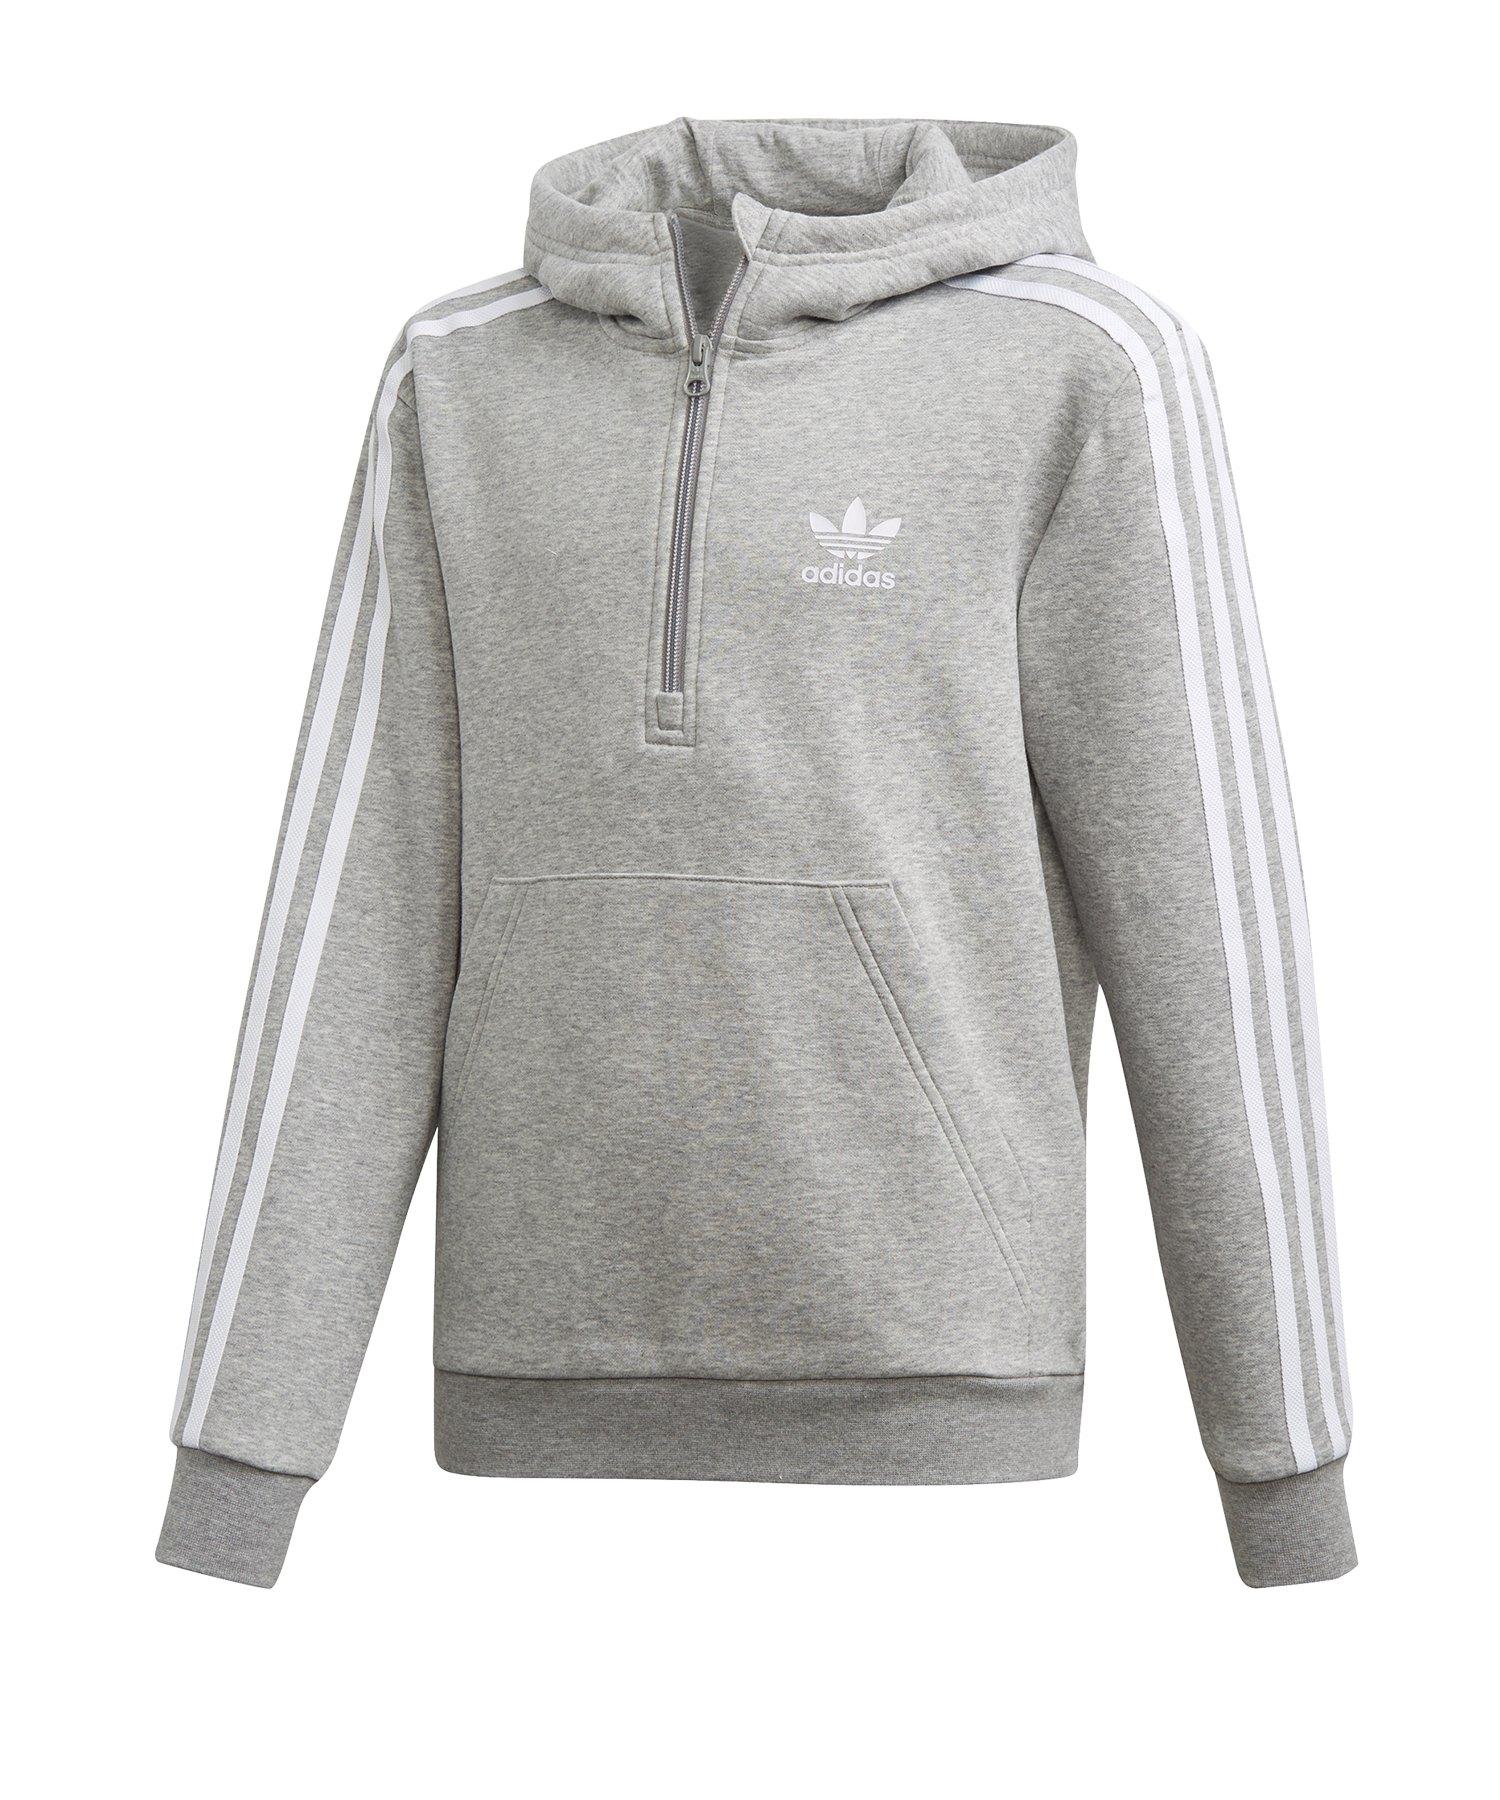 adidas sweater kinder